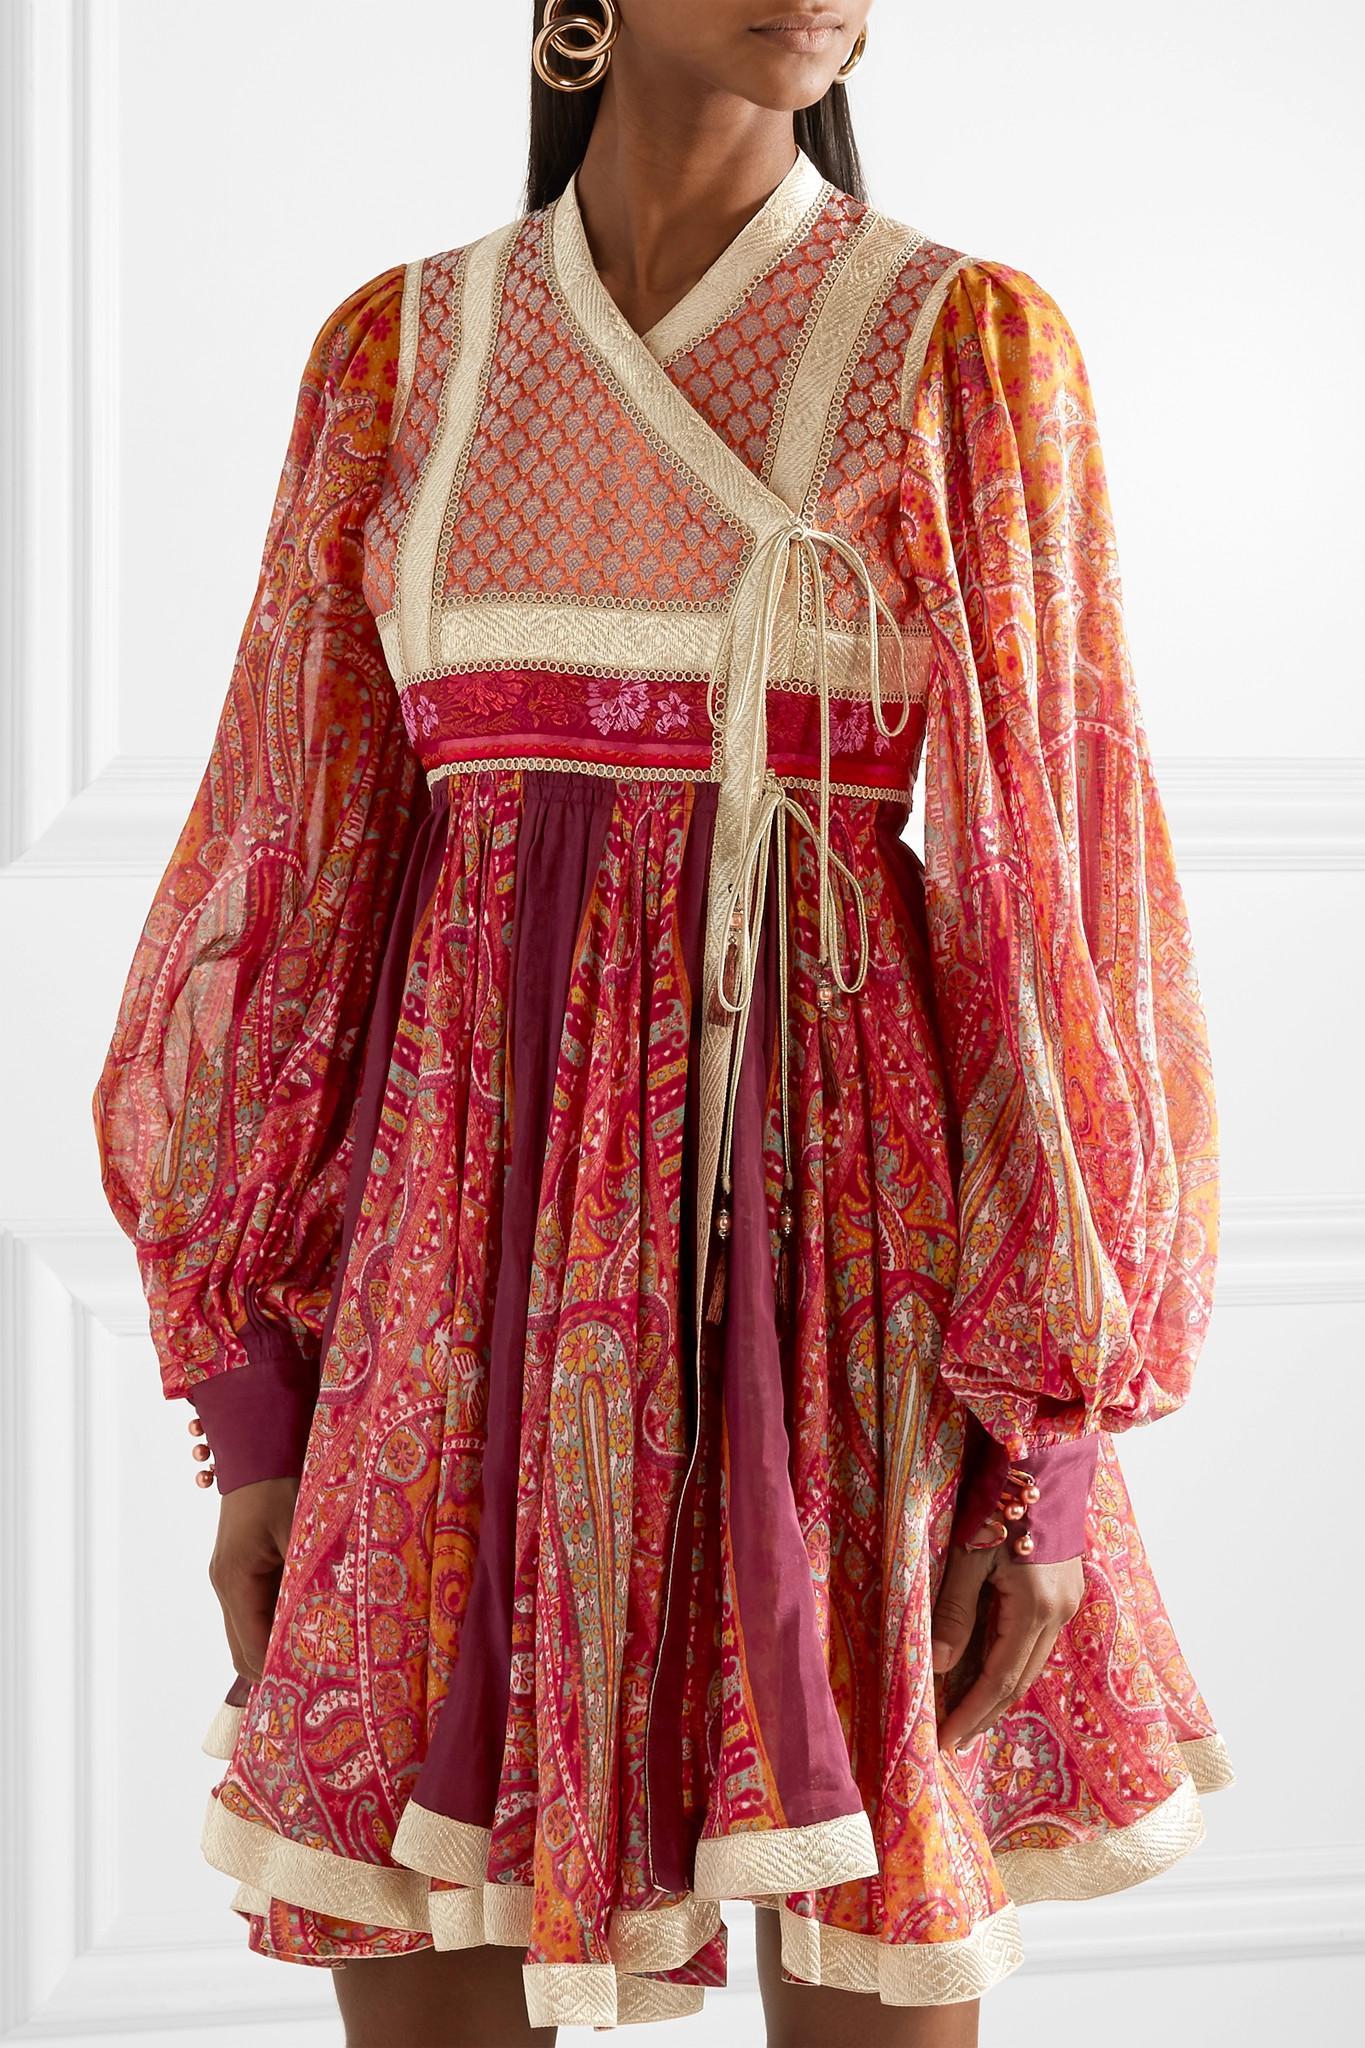 0135dfea4 etro-red-Paneled-Cotton-And-Silk-blend-Jacquard-And-Printed-Chiffon-Wrap-Dress.jpeg